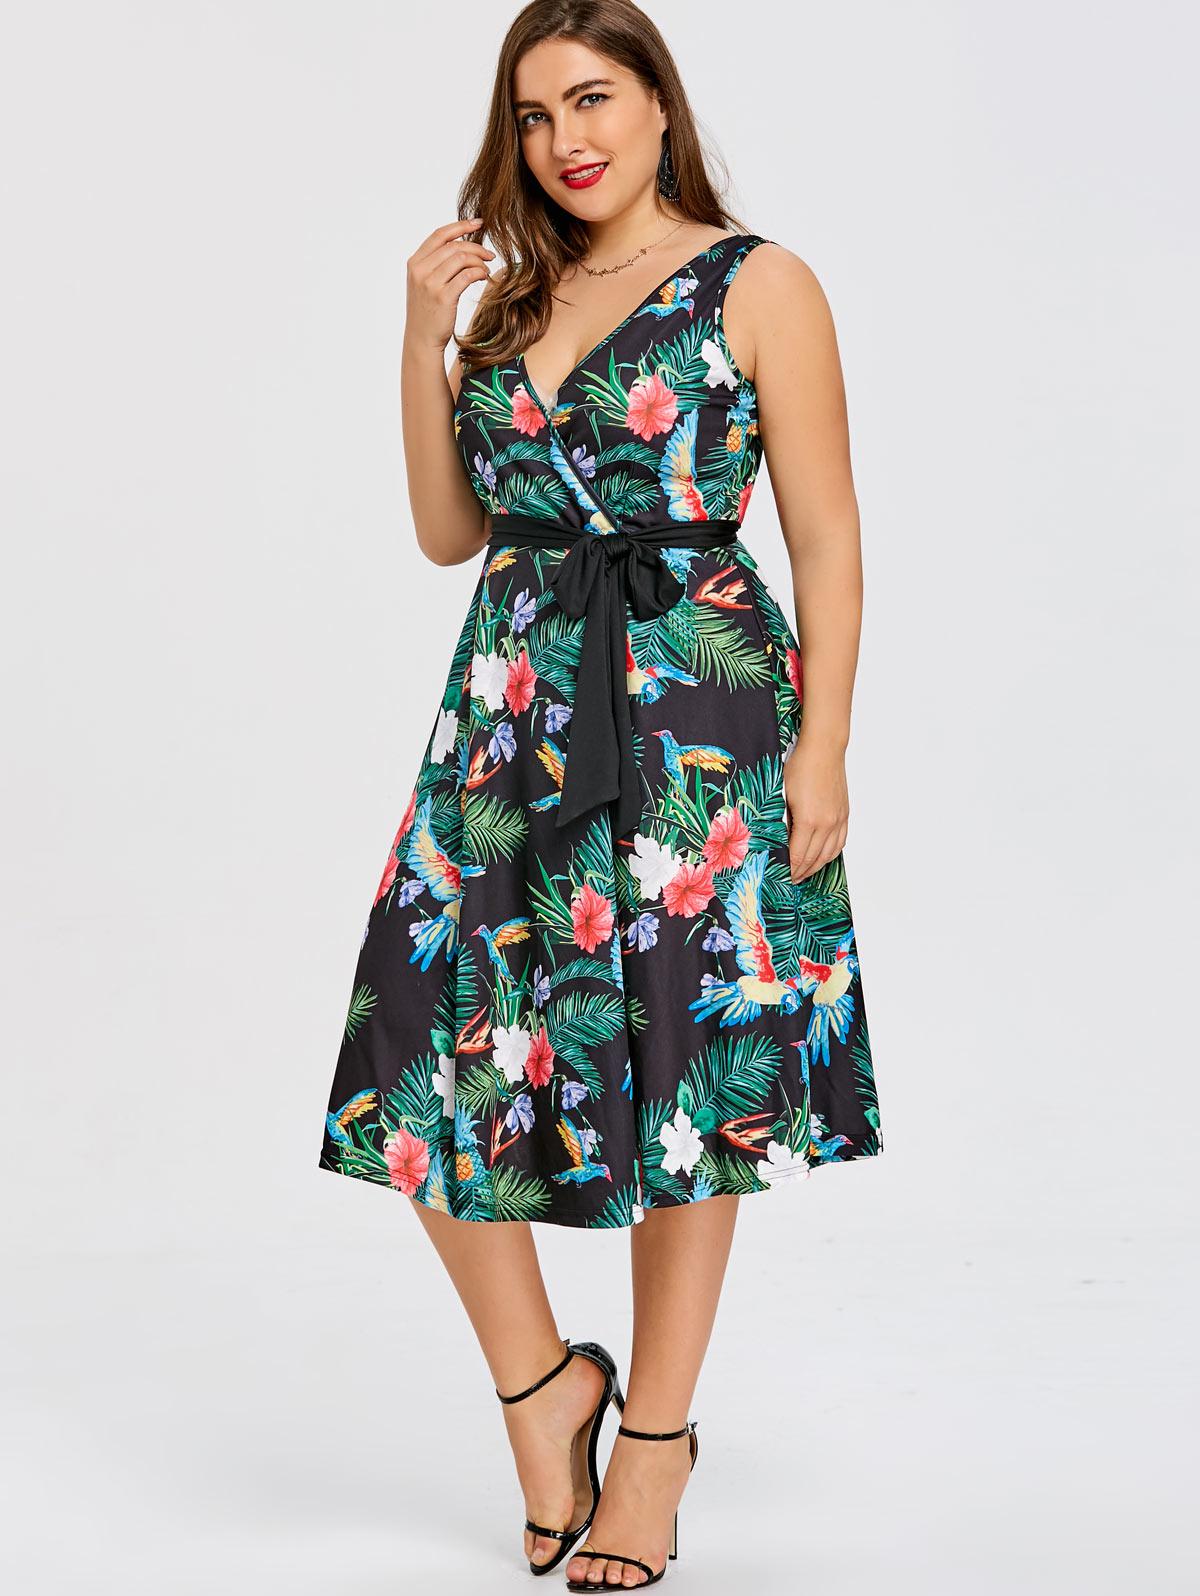 US $15.33 53% OFF|Wipalo Plus Size Hawaiian Leaf Midi Boho Dress Women  Sleeveless V Neck Belted Elegant Party Vintage Dresses Robe Vestido 5XL-in  ...